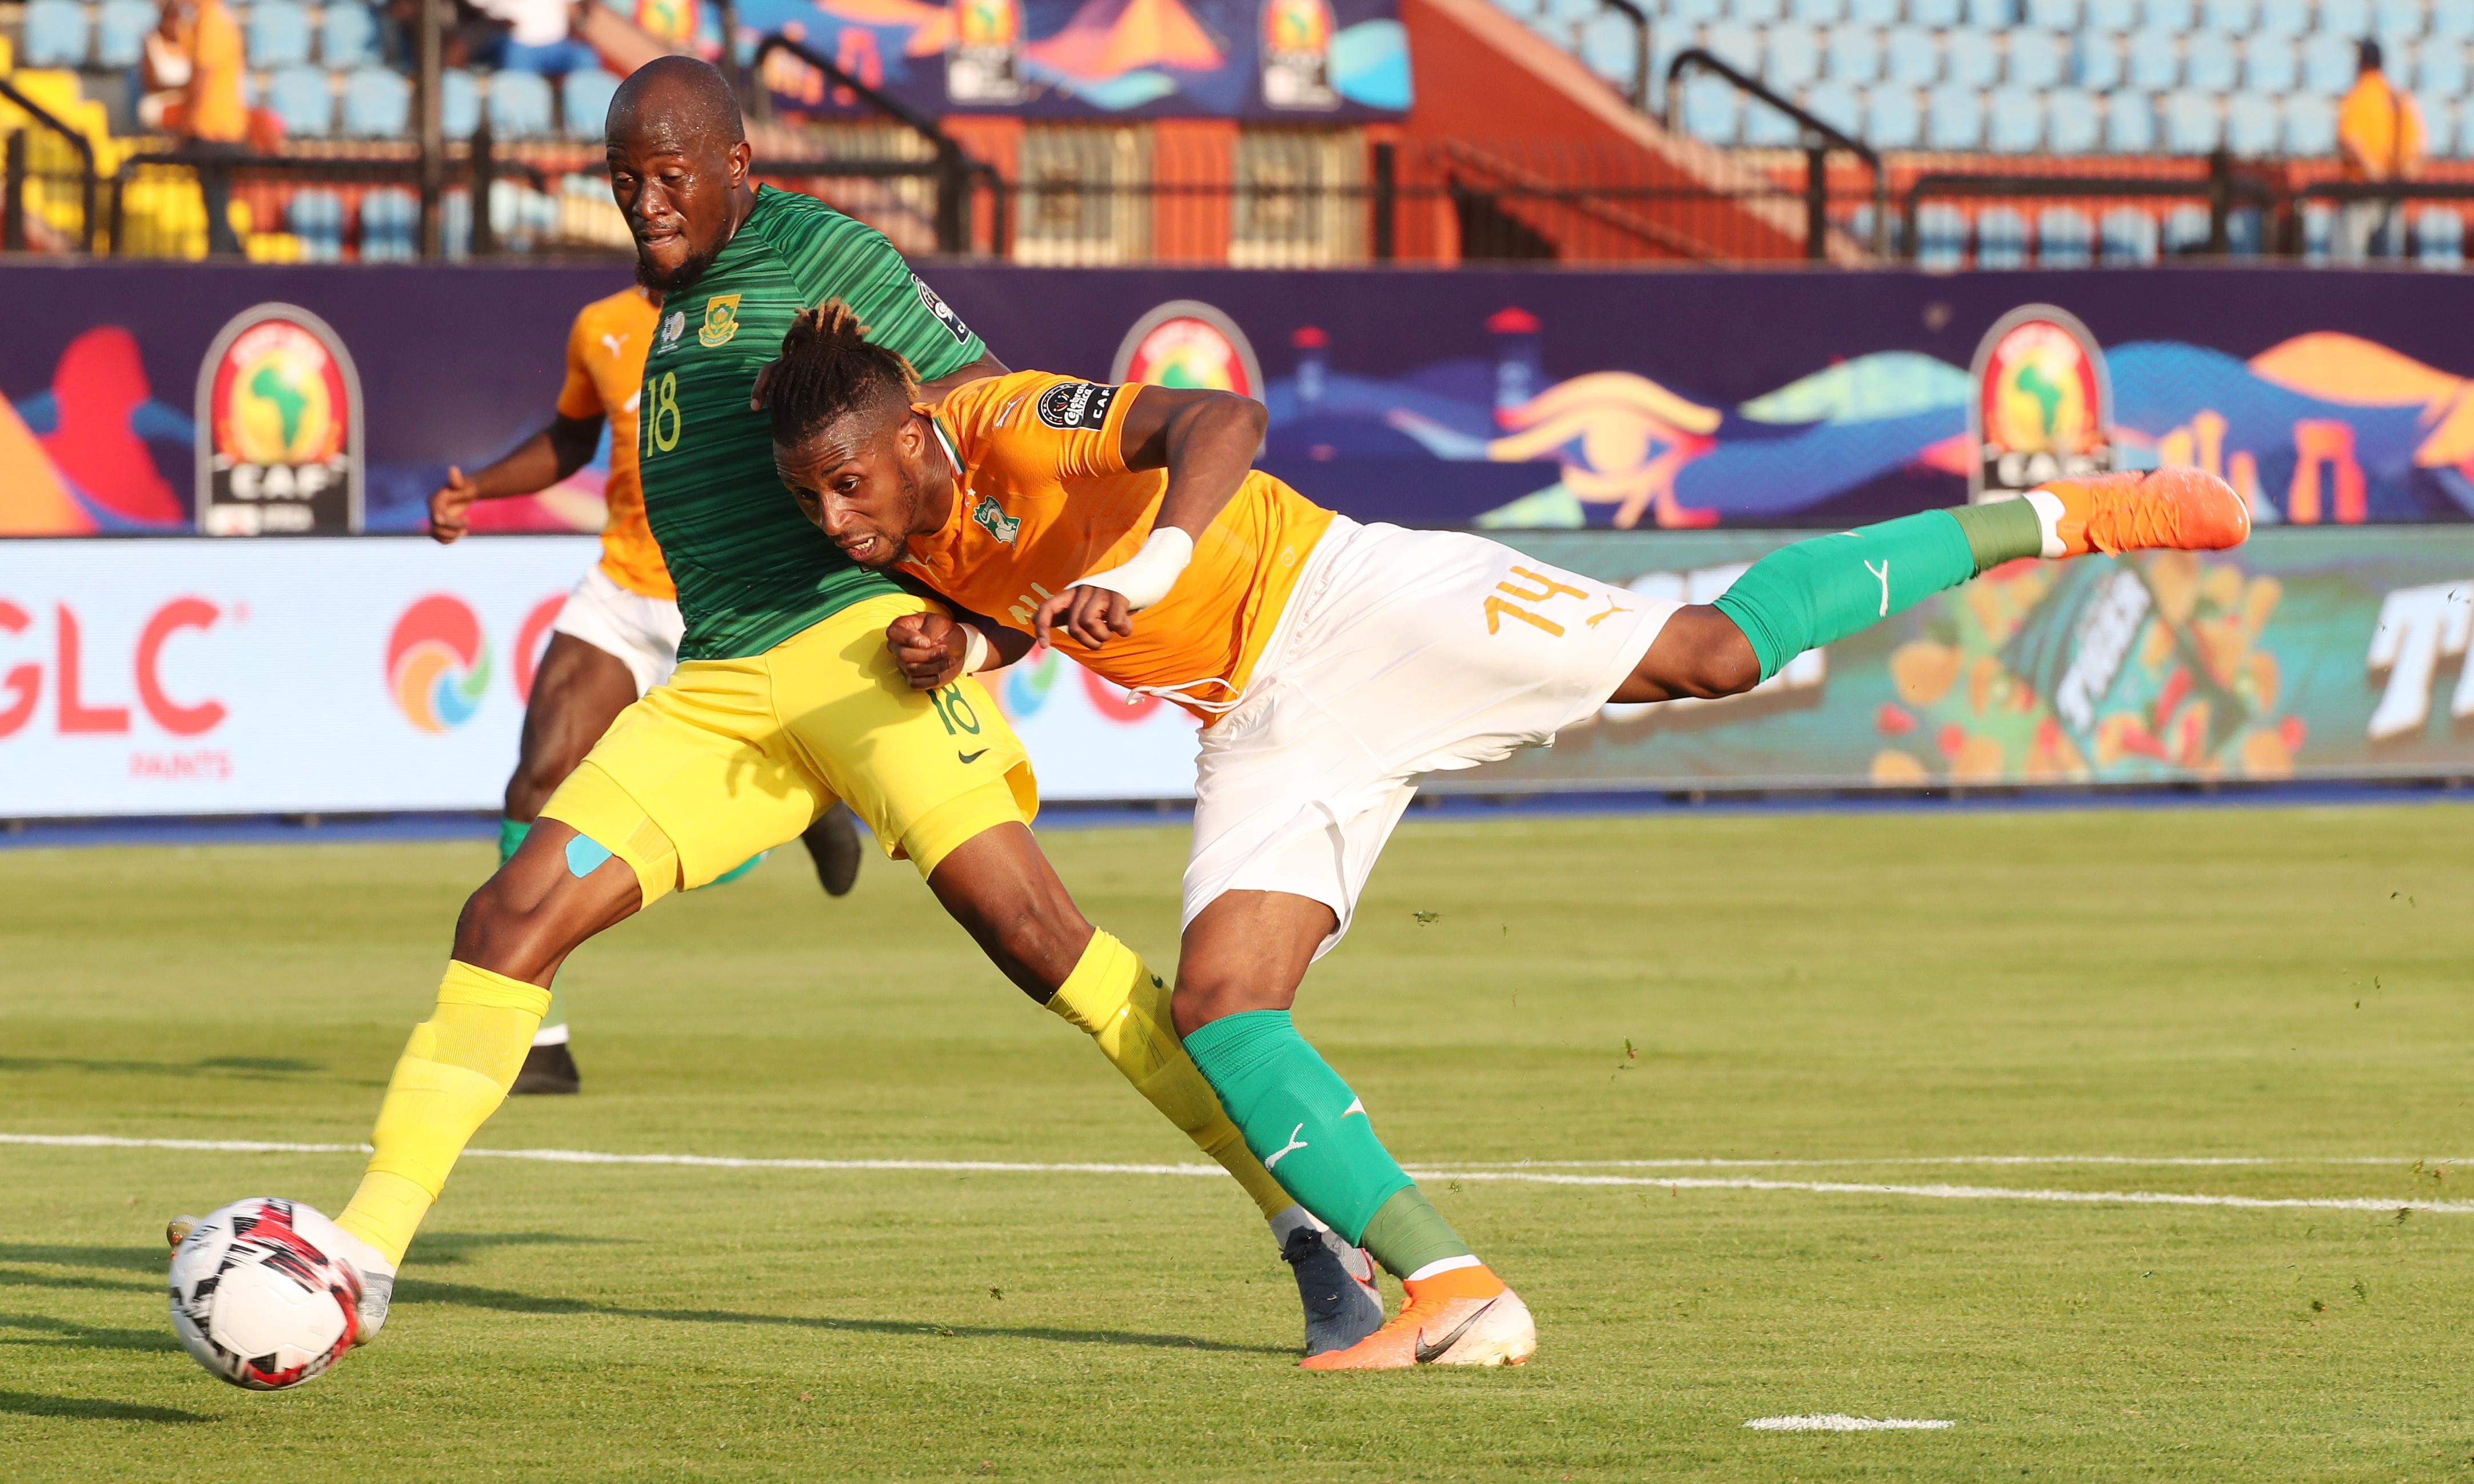 Ivory Coast off to winning start as Jonathan Kodjia sinks South Africa